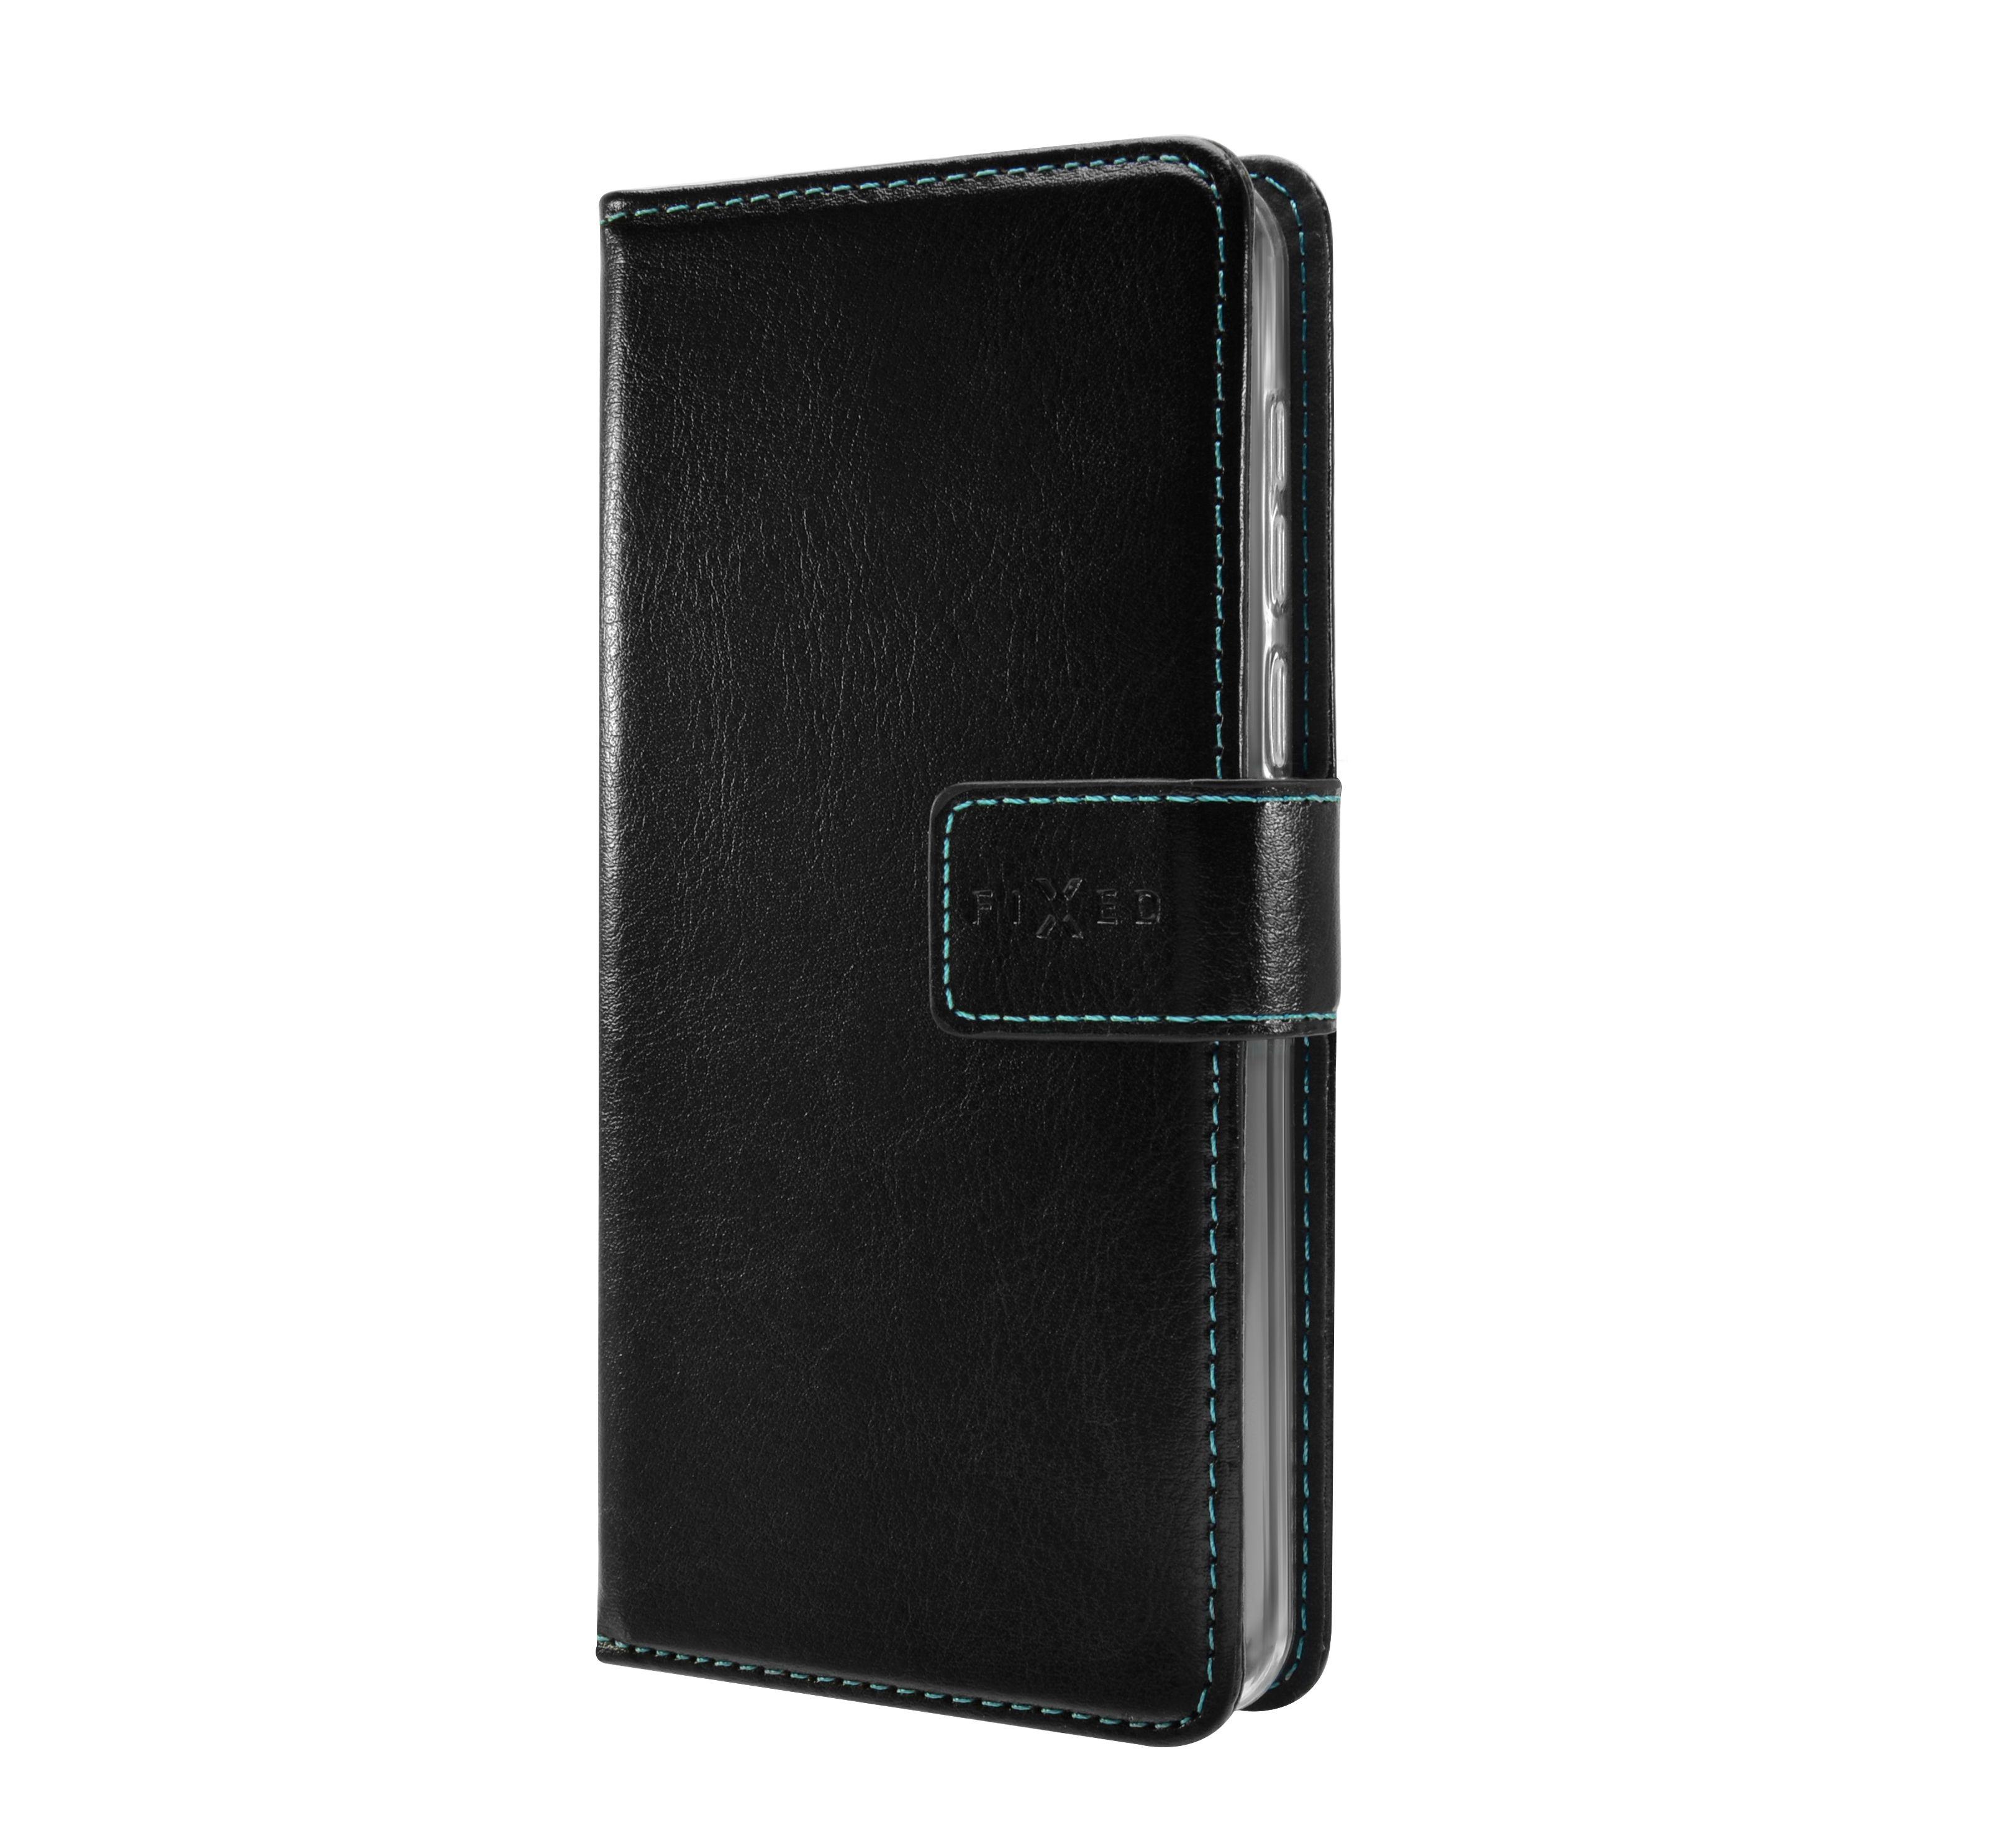 Pouzdro typu kniha FIXED Opus pro Huawei Nova 3, černé